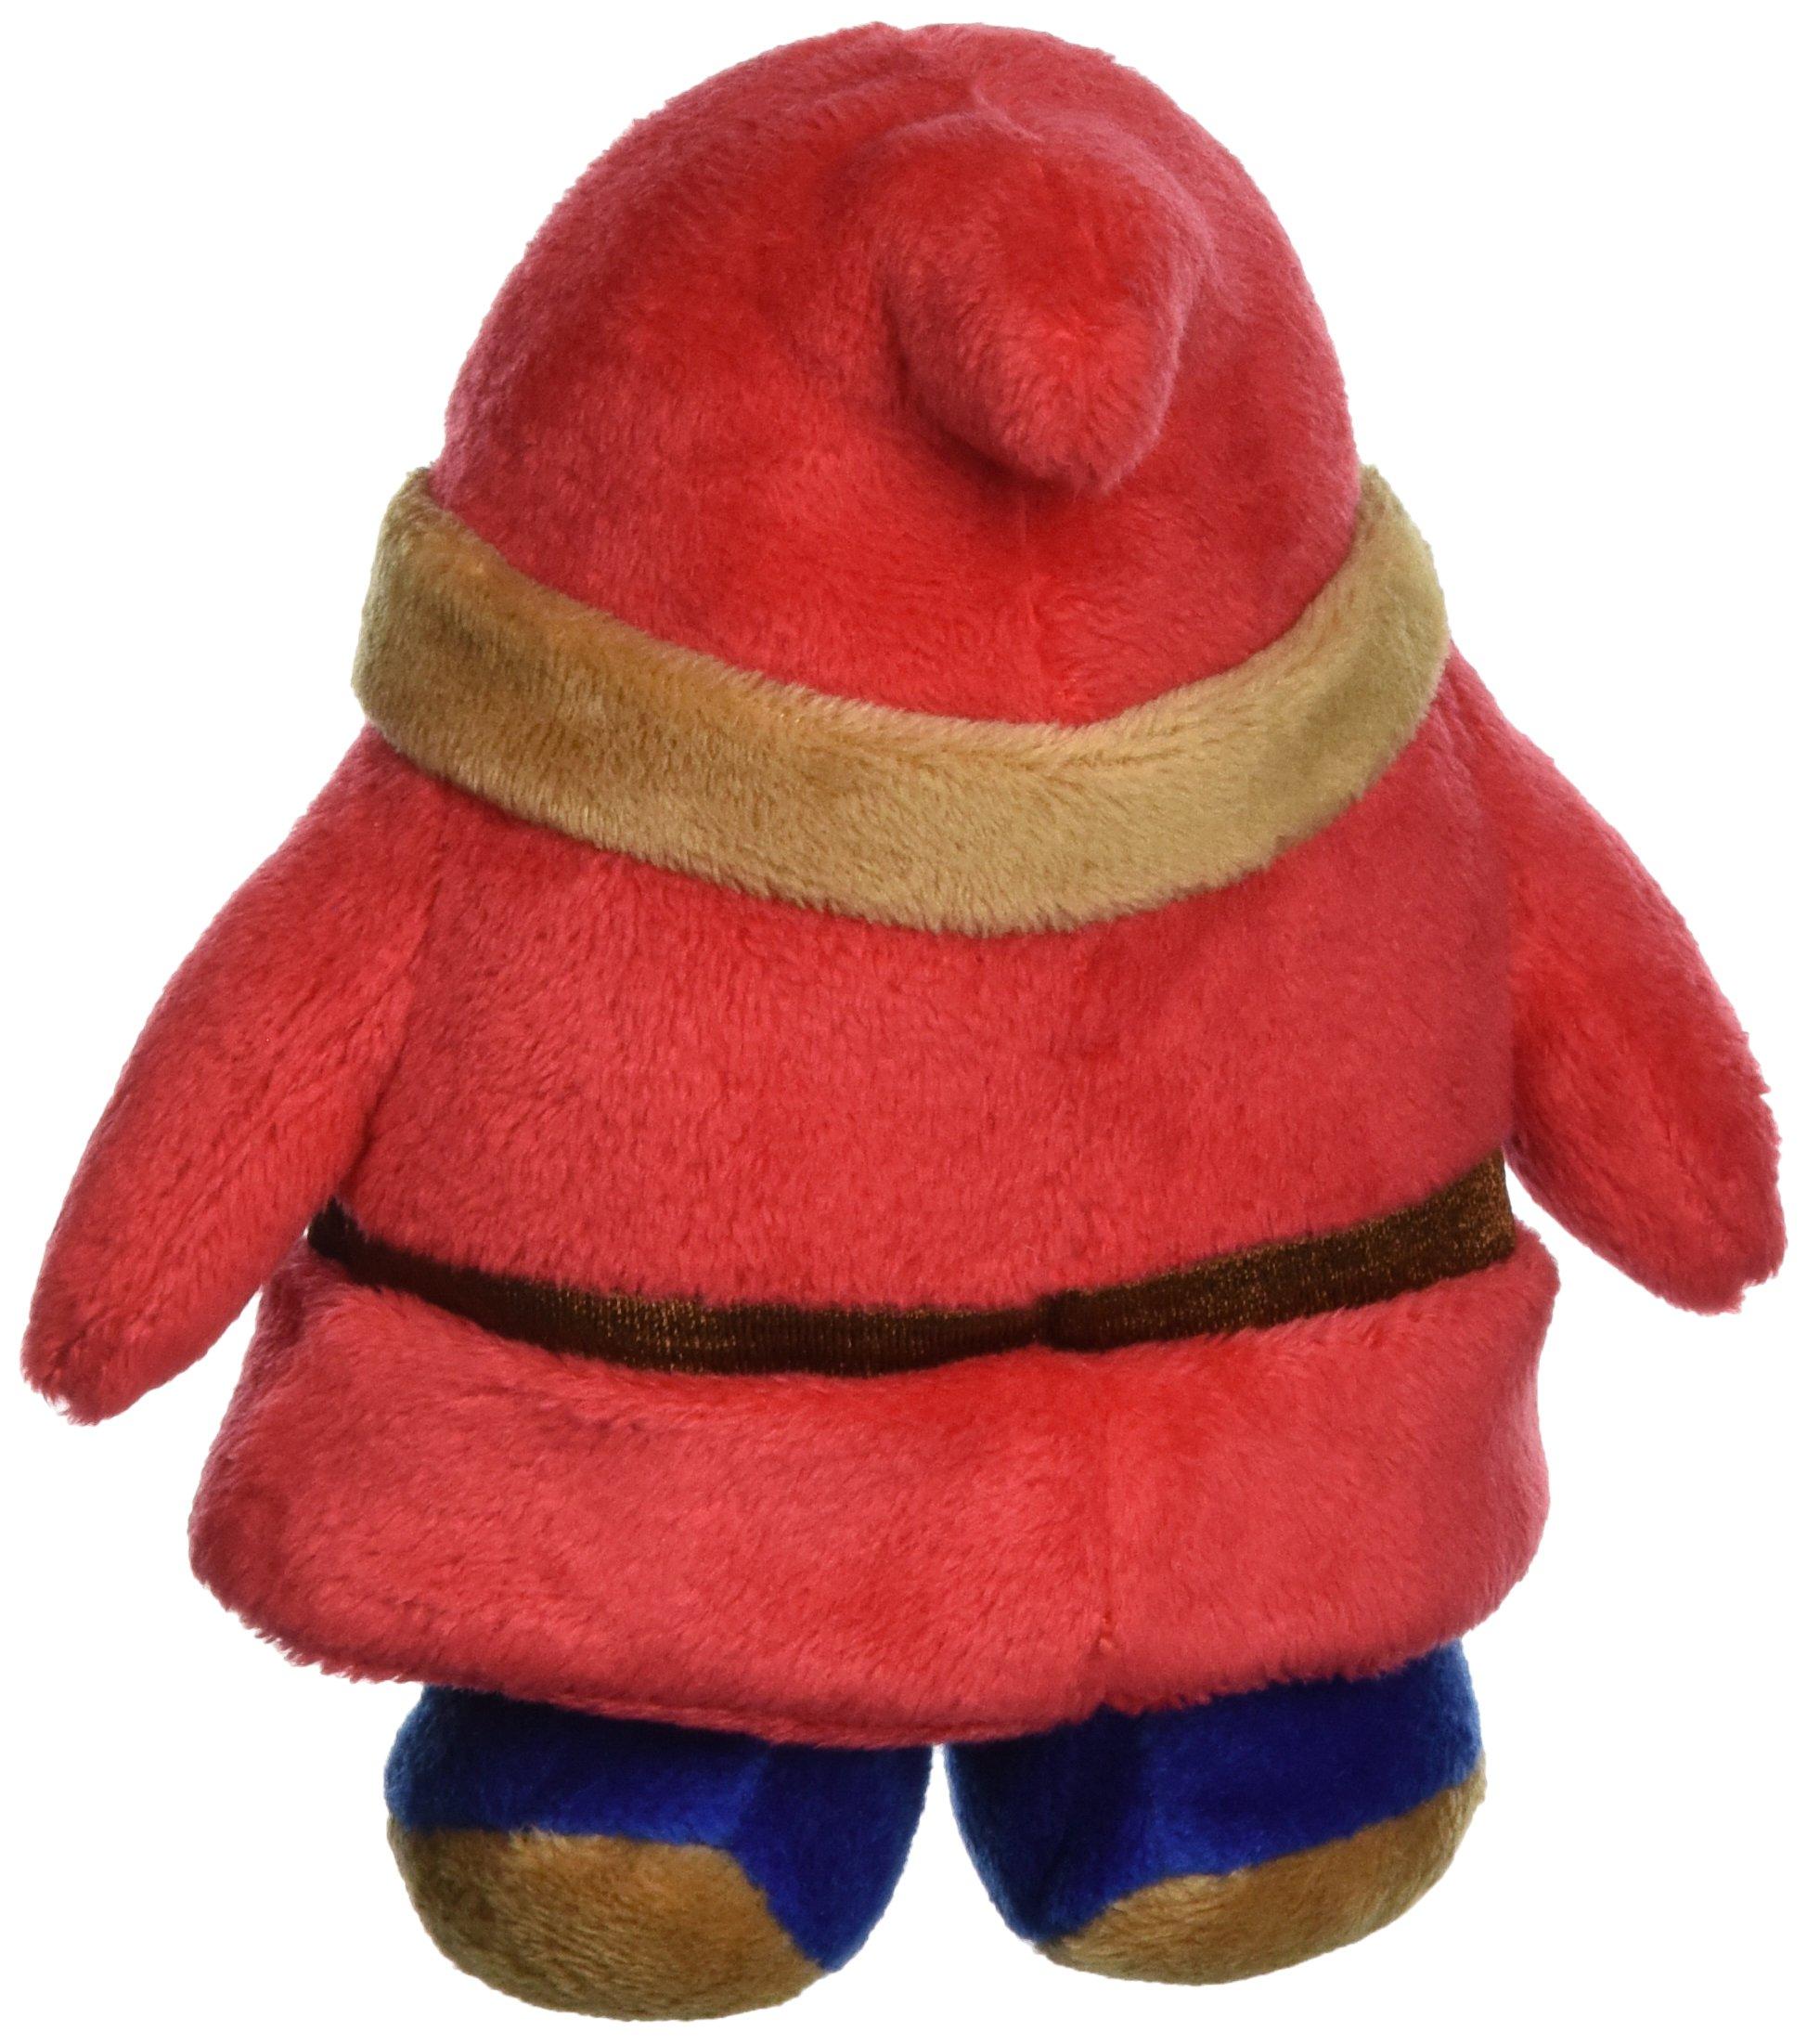 Shy Guy Stuffed Plush Toy 1x Sanei AC25 Super Mario All Star Collection